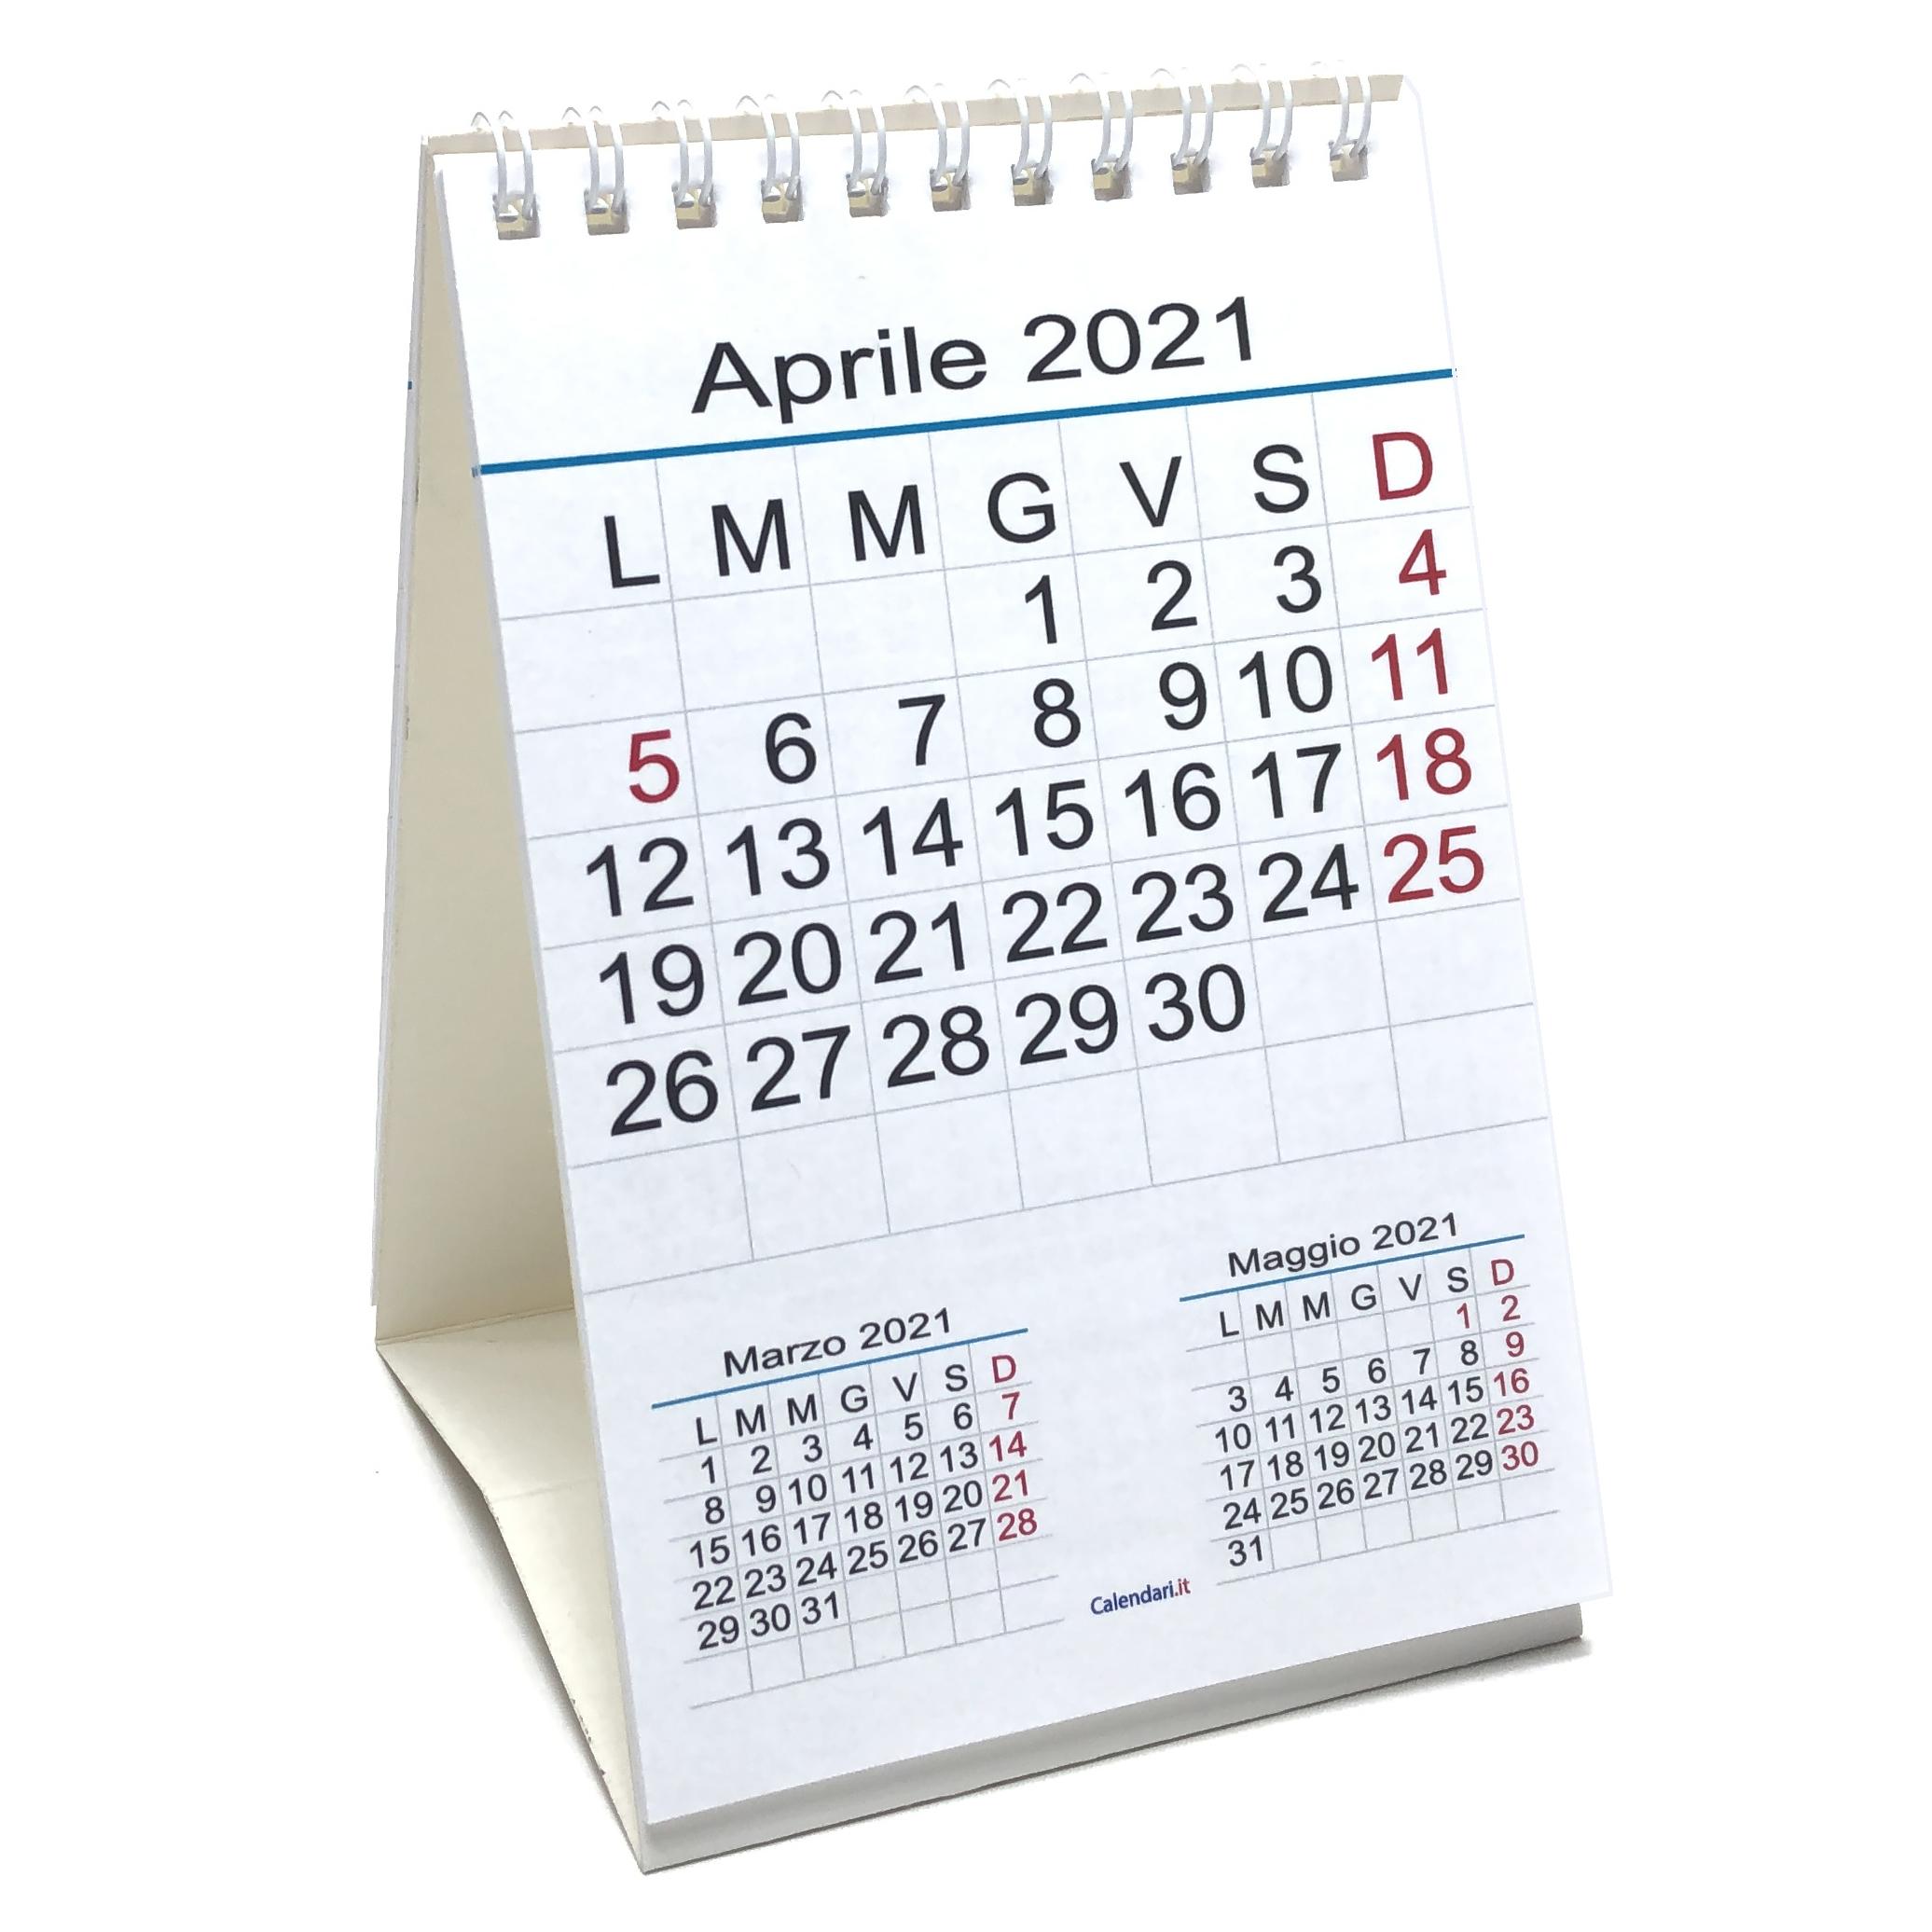 Calendario 2021 tavolo numeri grandi 3 mesi 10x15 cm   Calendari